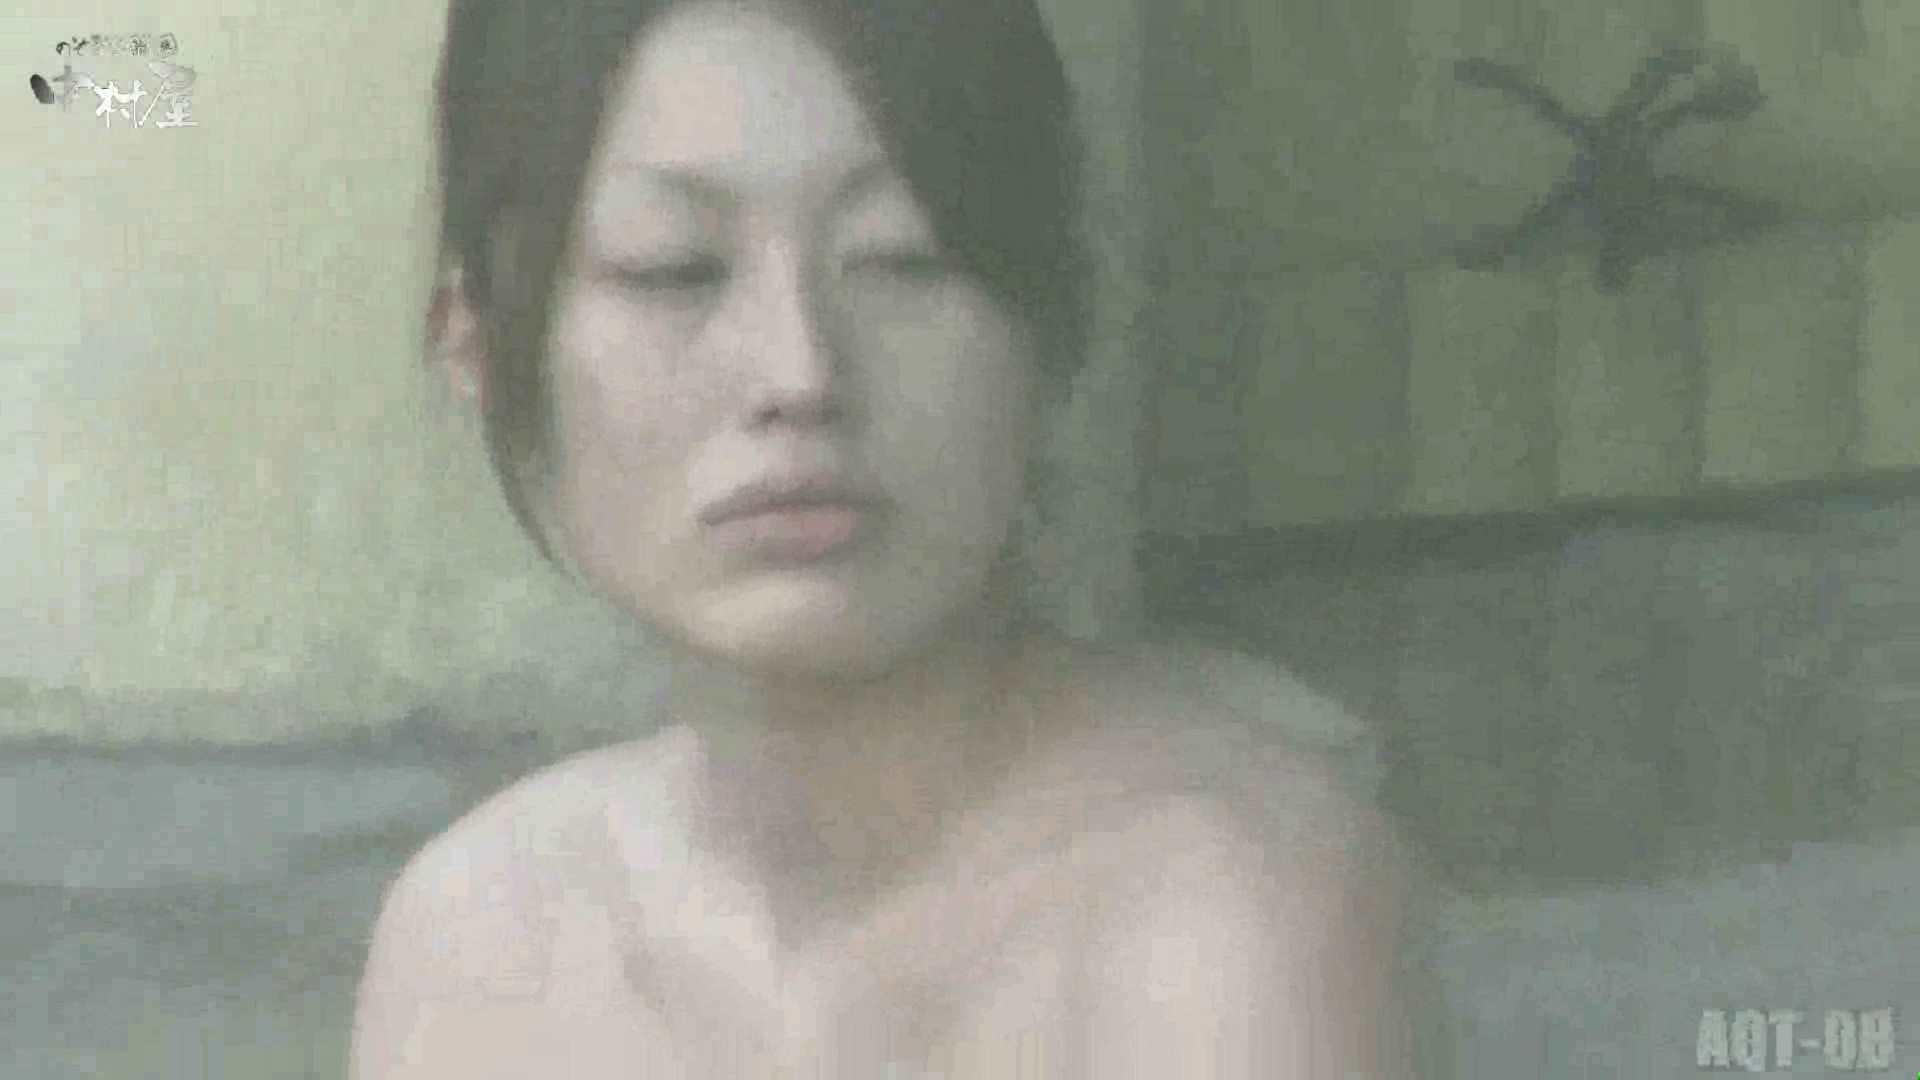 Aquaな露天風呂Vol.872潜入盗撮露天風呂八判湯 其の三 盗撮 | 潜入  53枚 9